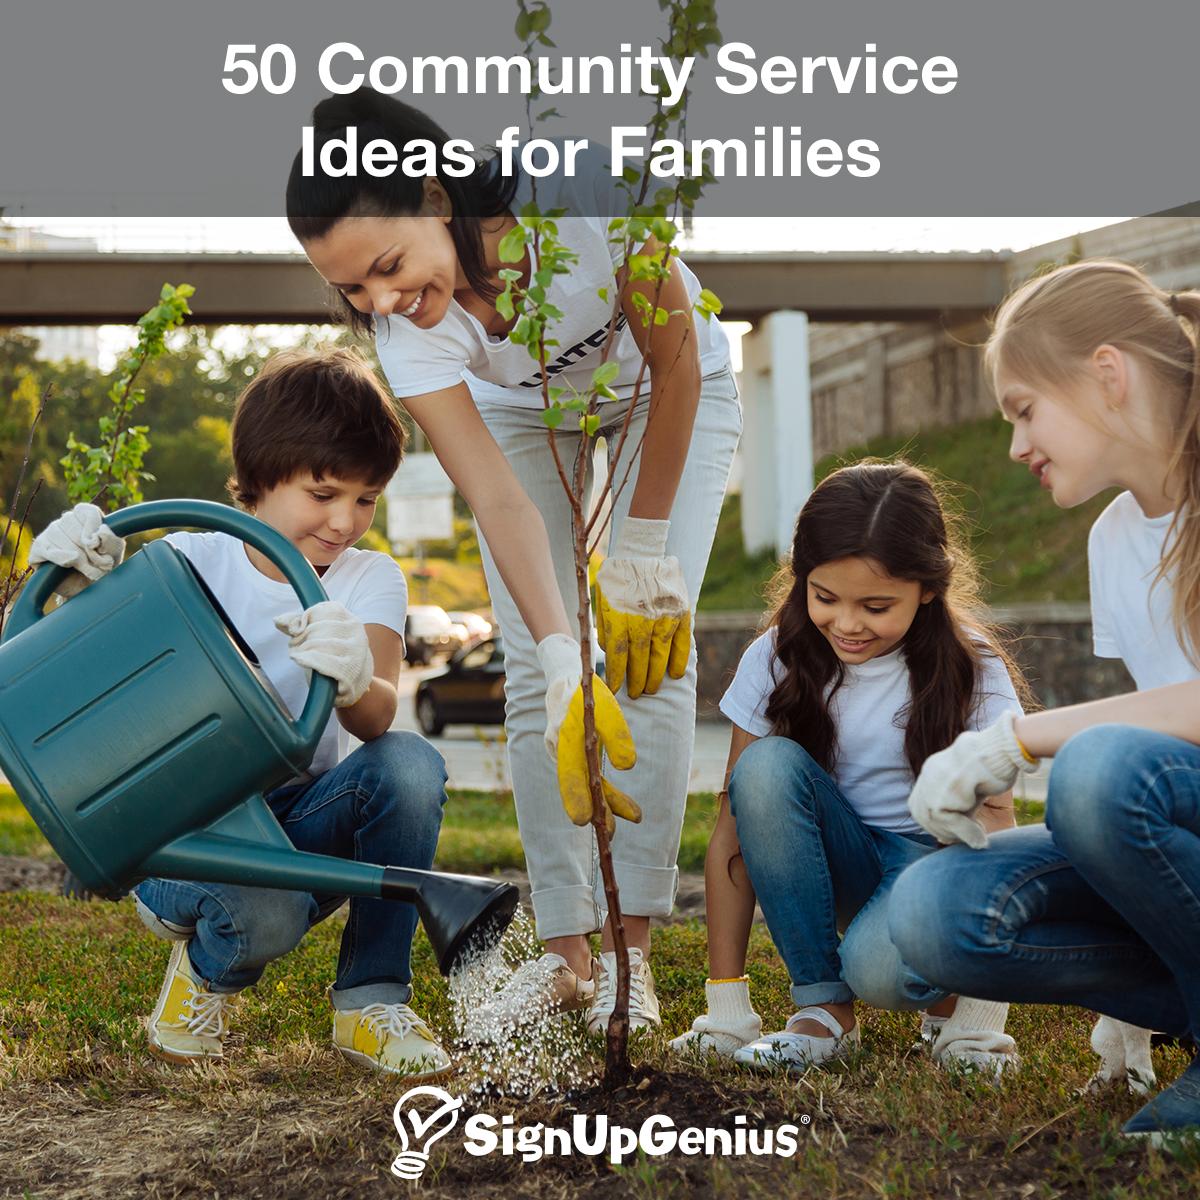 50 Community Service Ideas for Families Community